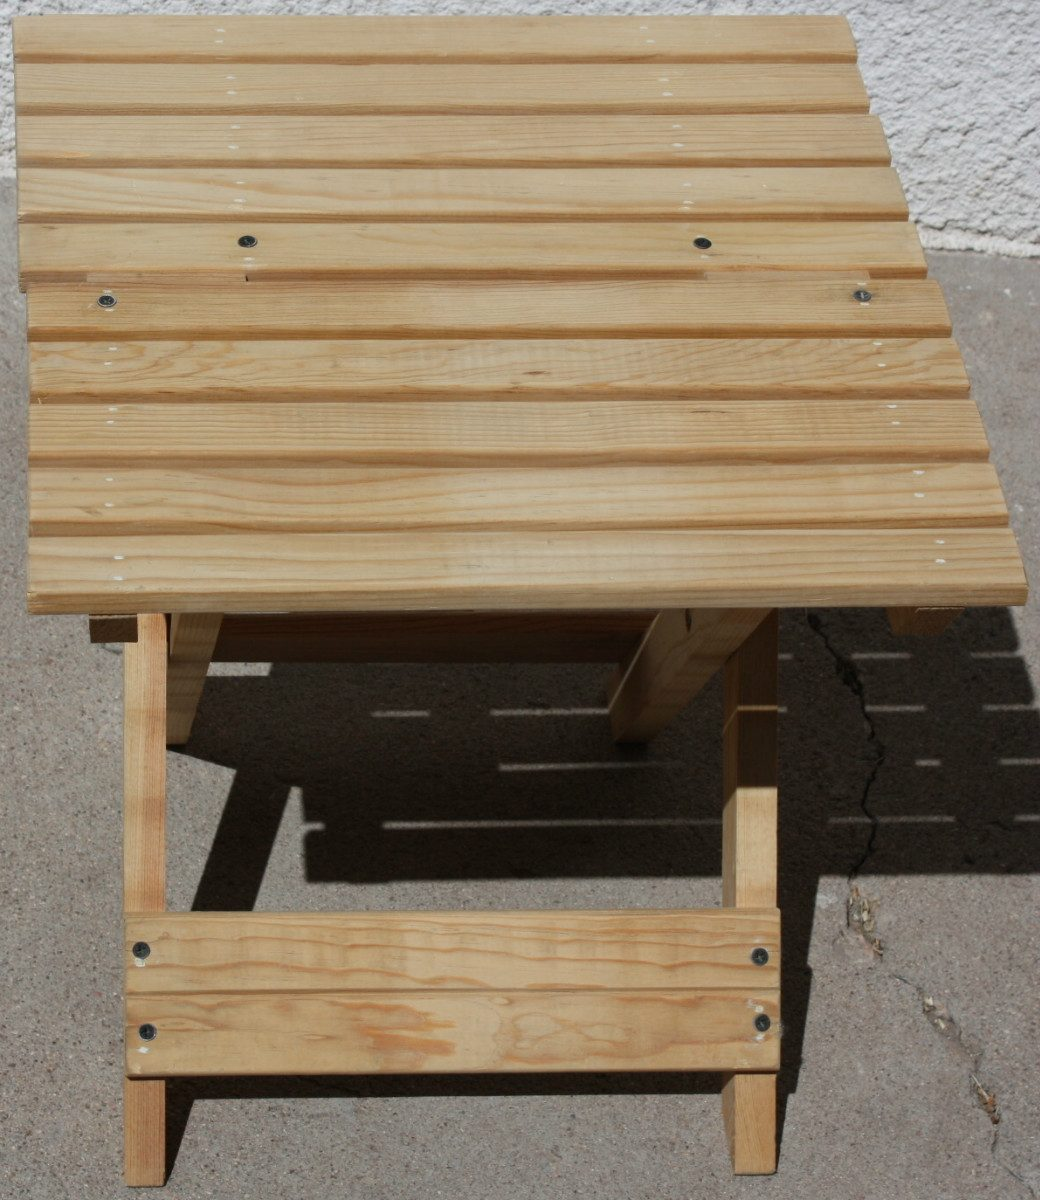 Banco de jard n mueble plegable madera jardin interiores - Banco madera jardin ...